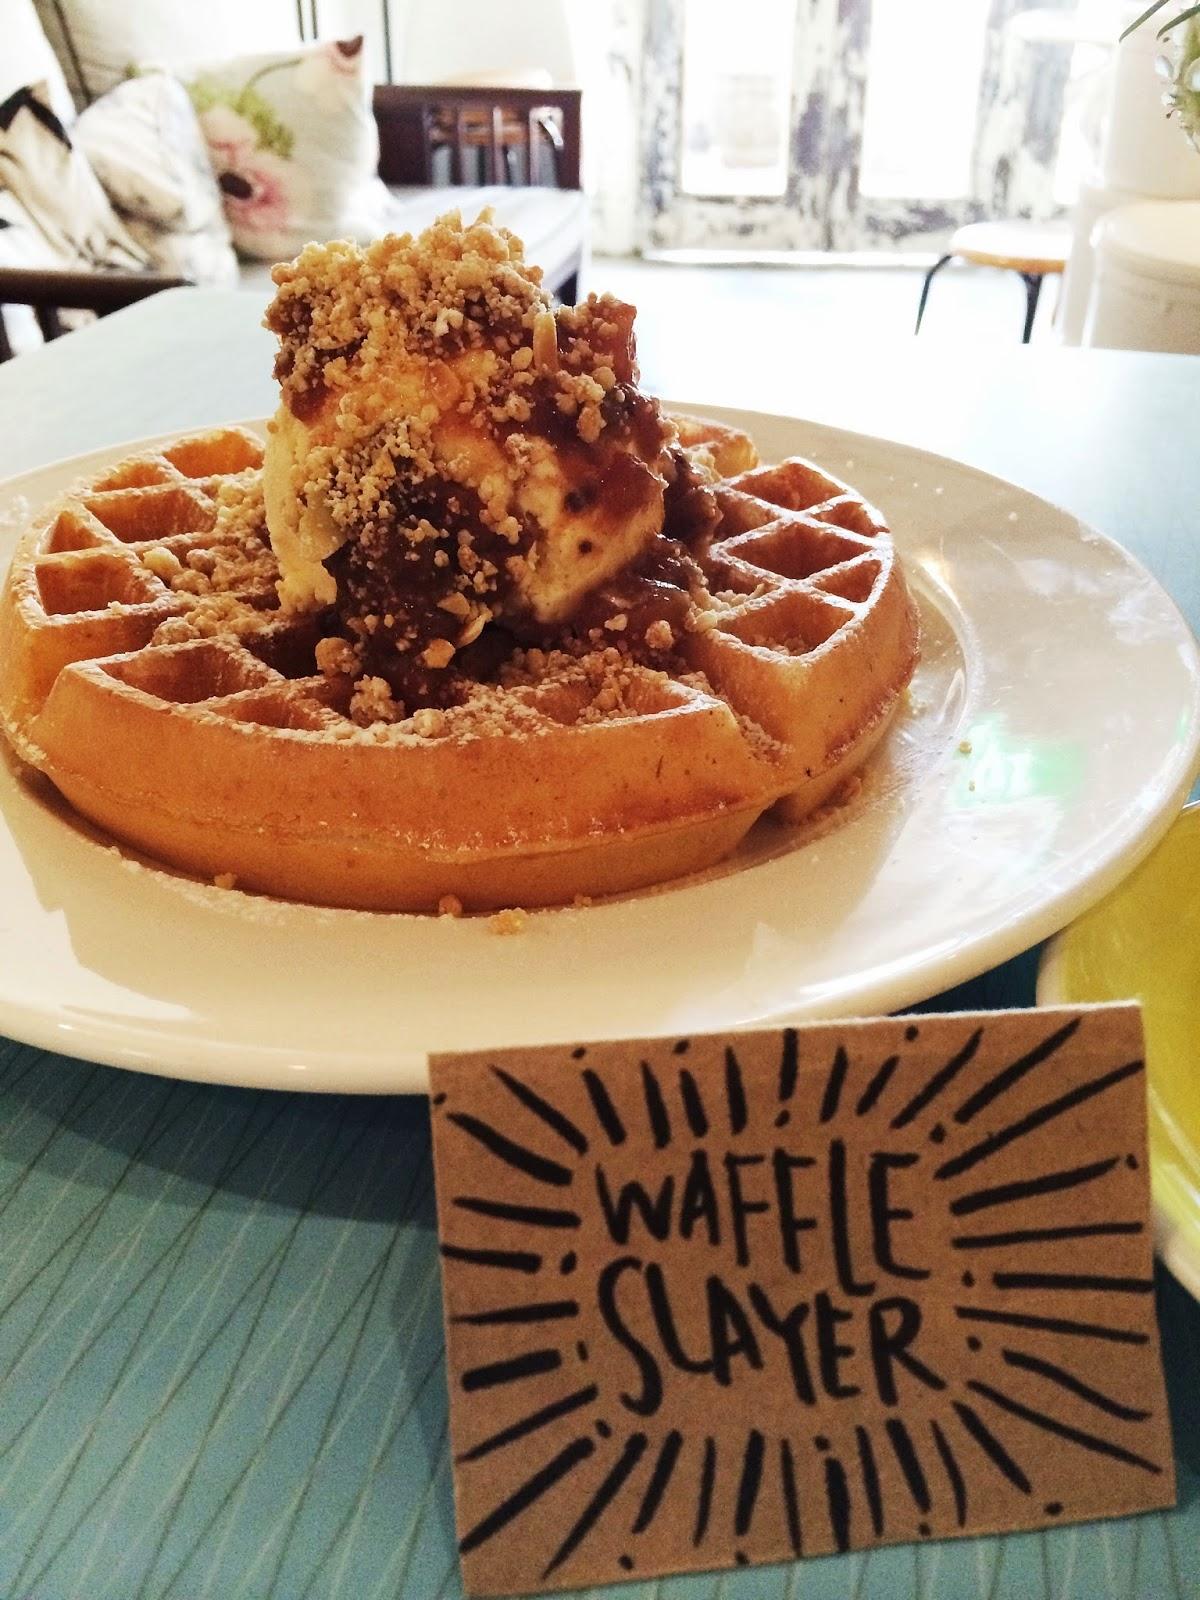 Apple & Almond Crumble Buttermilk Waffle with Vanilla Ice-Cream